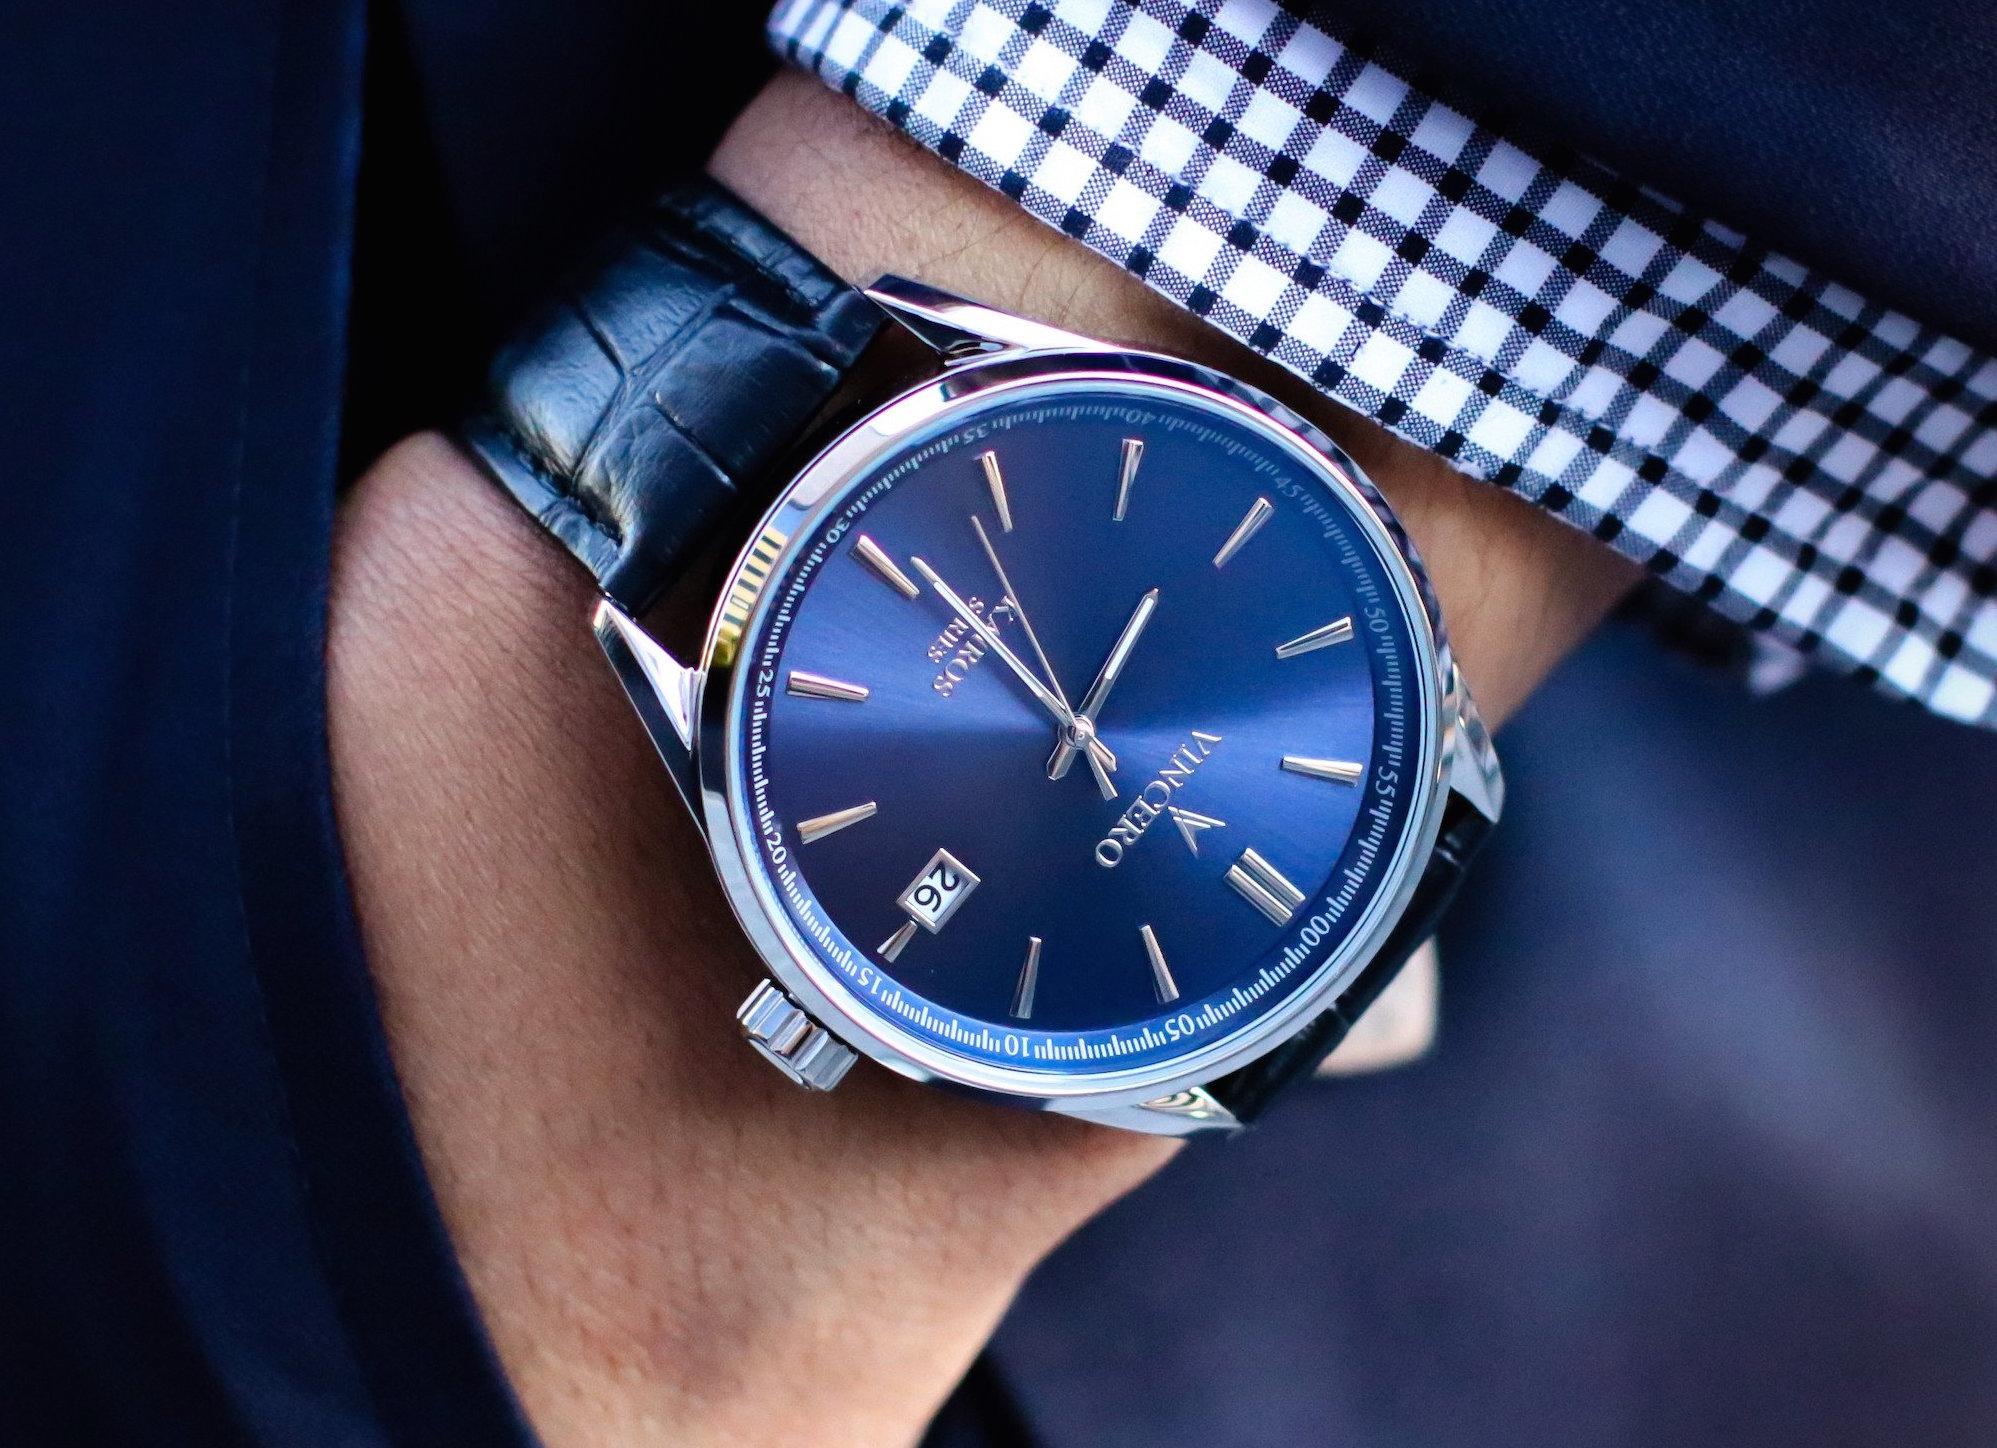 Vincero Kairos Watch Review - WatchReviewBlog